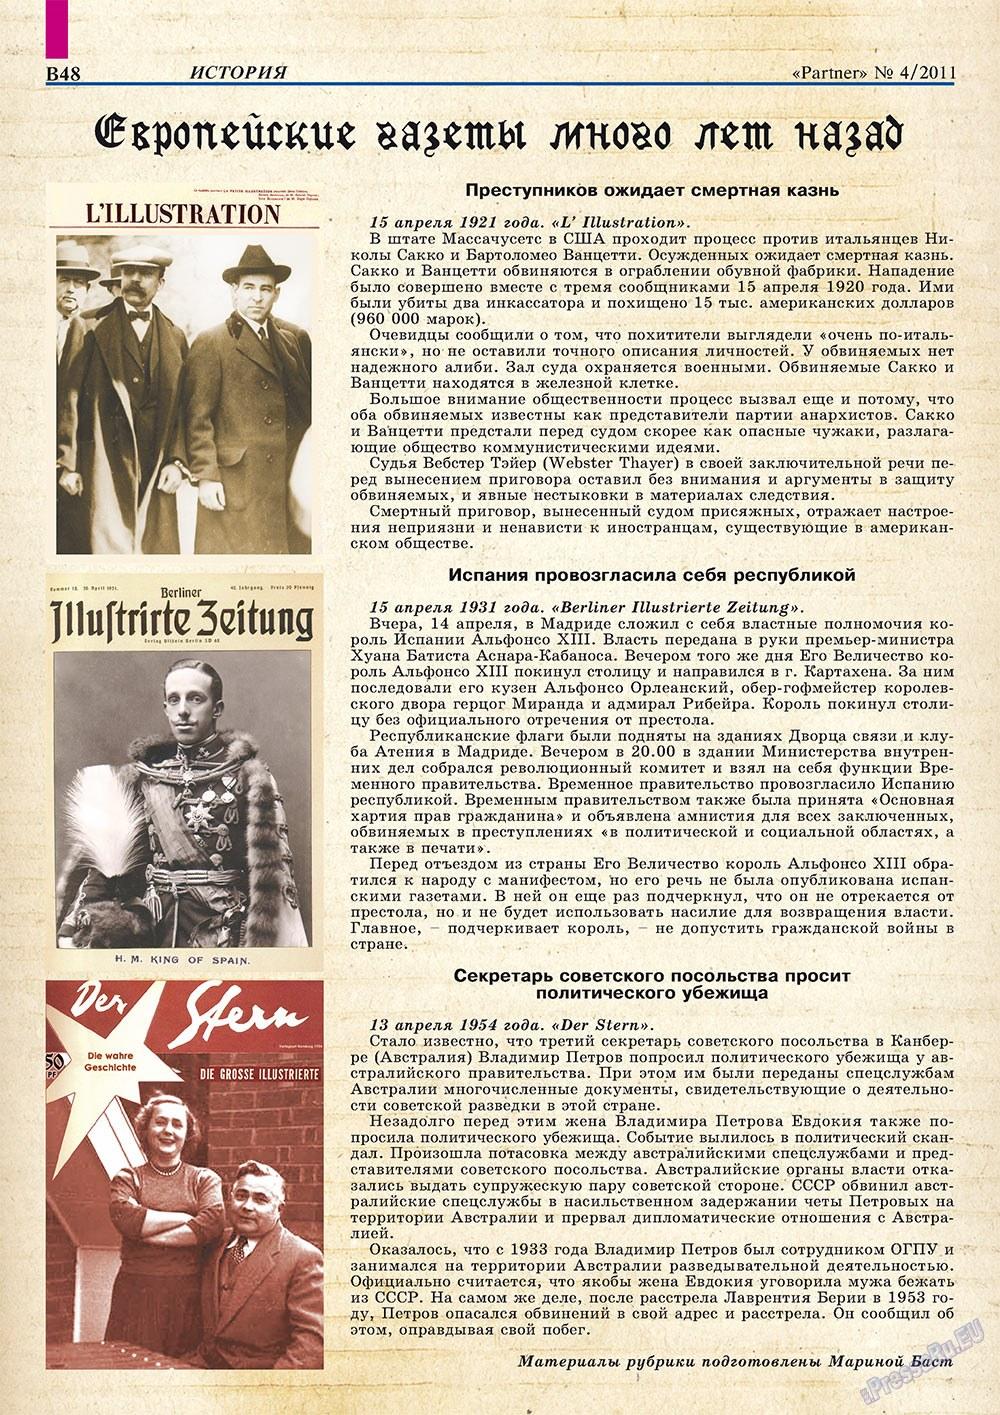 Партнер-север (журнал). 2011 год, номер 4, стр. 58